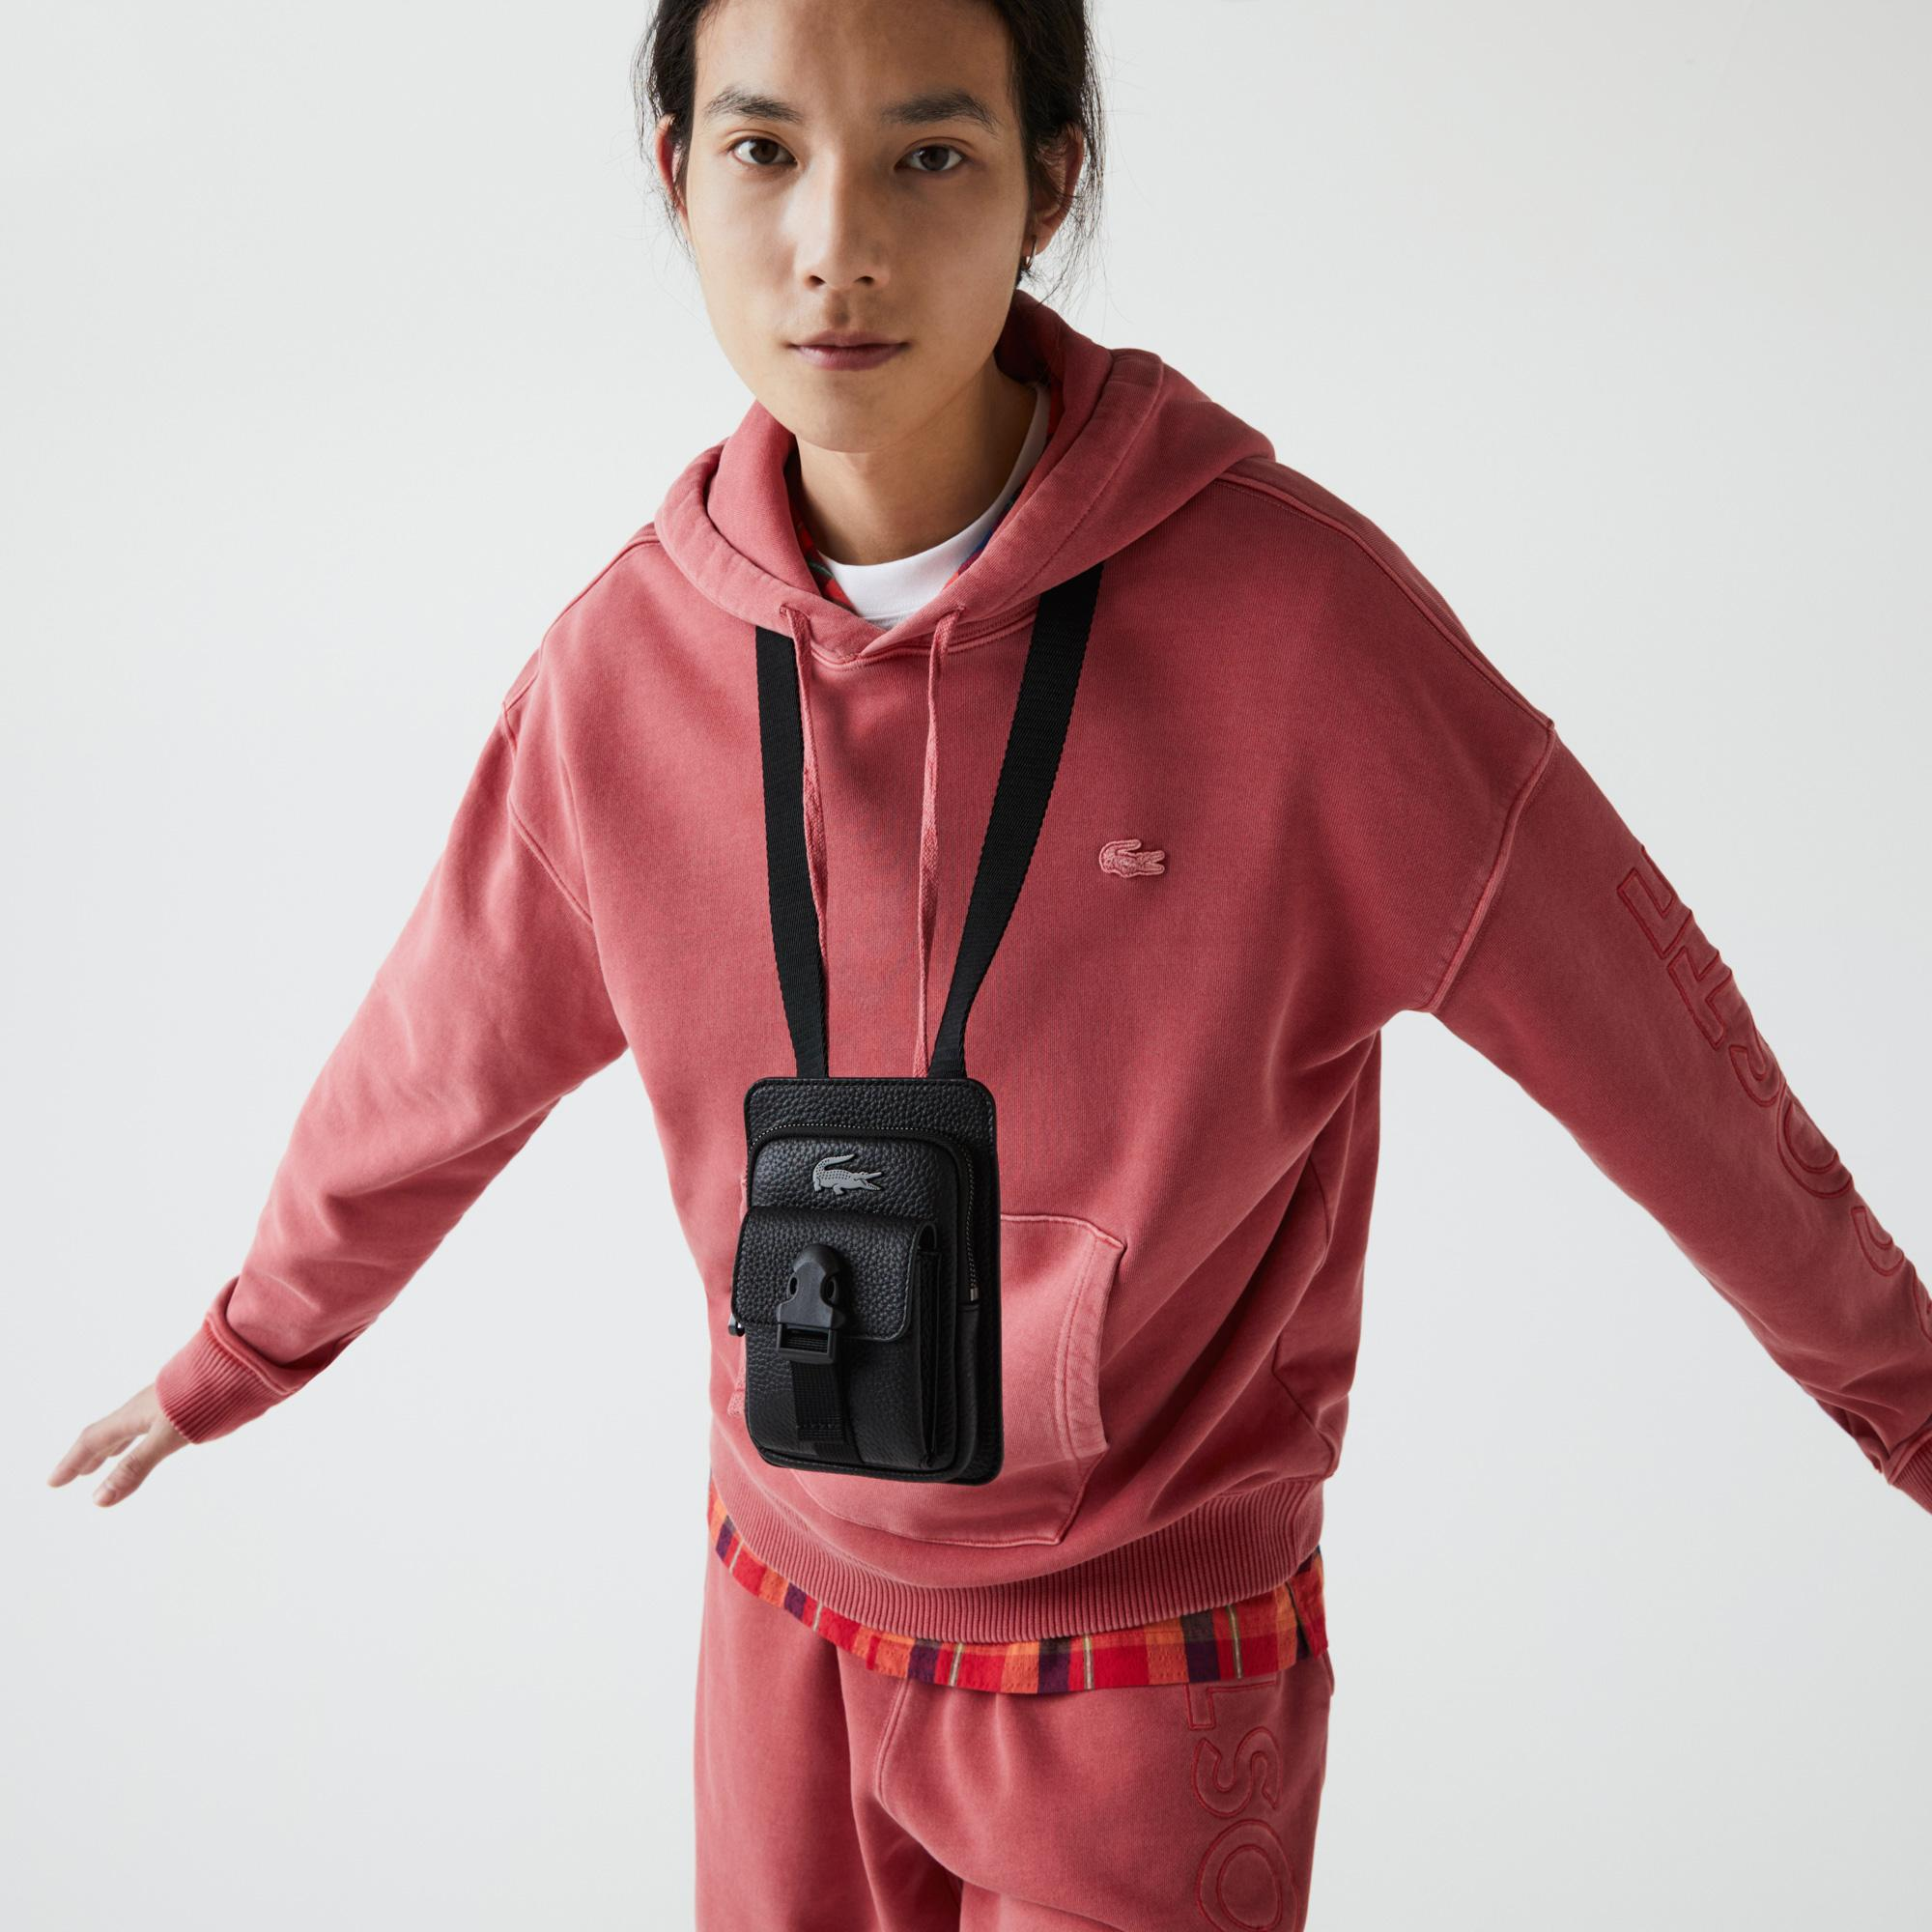 Lacoste Męska torba Slg Man Premium